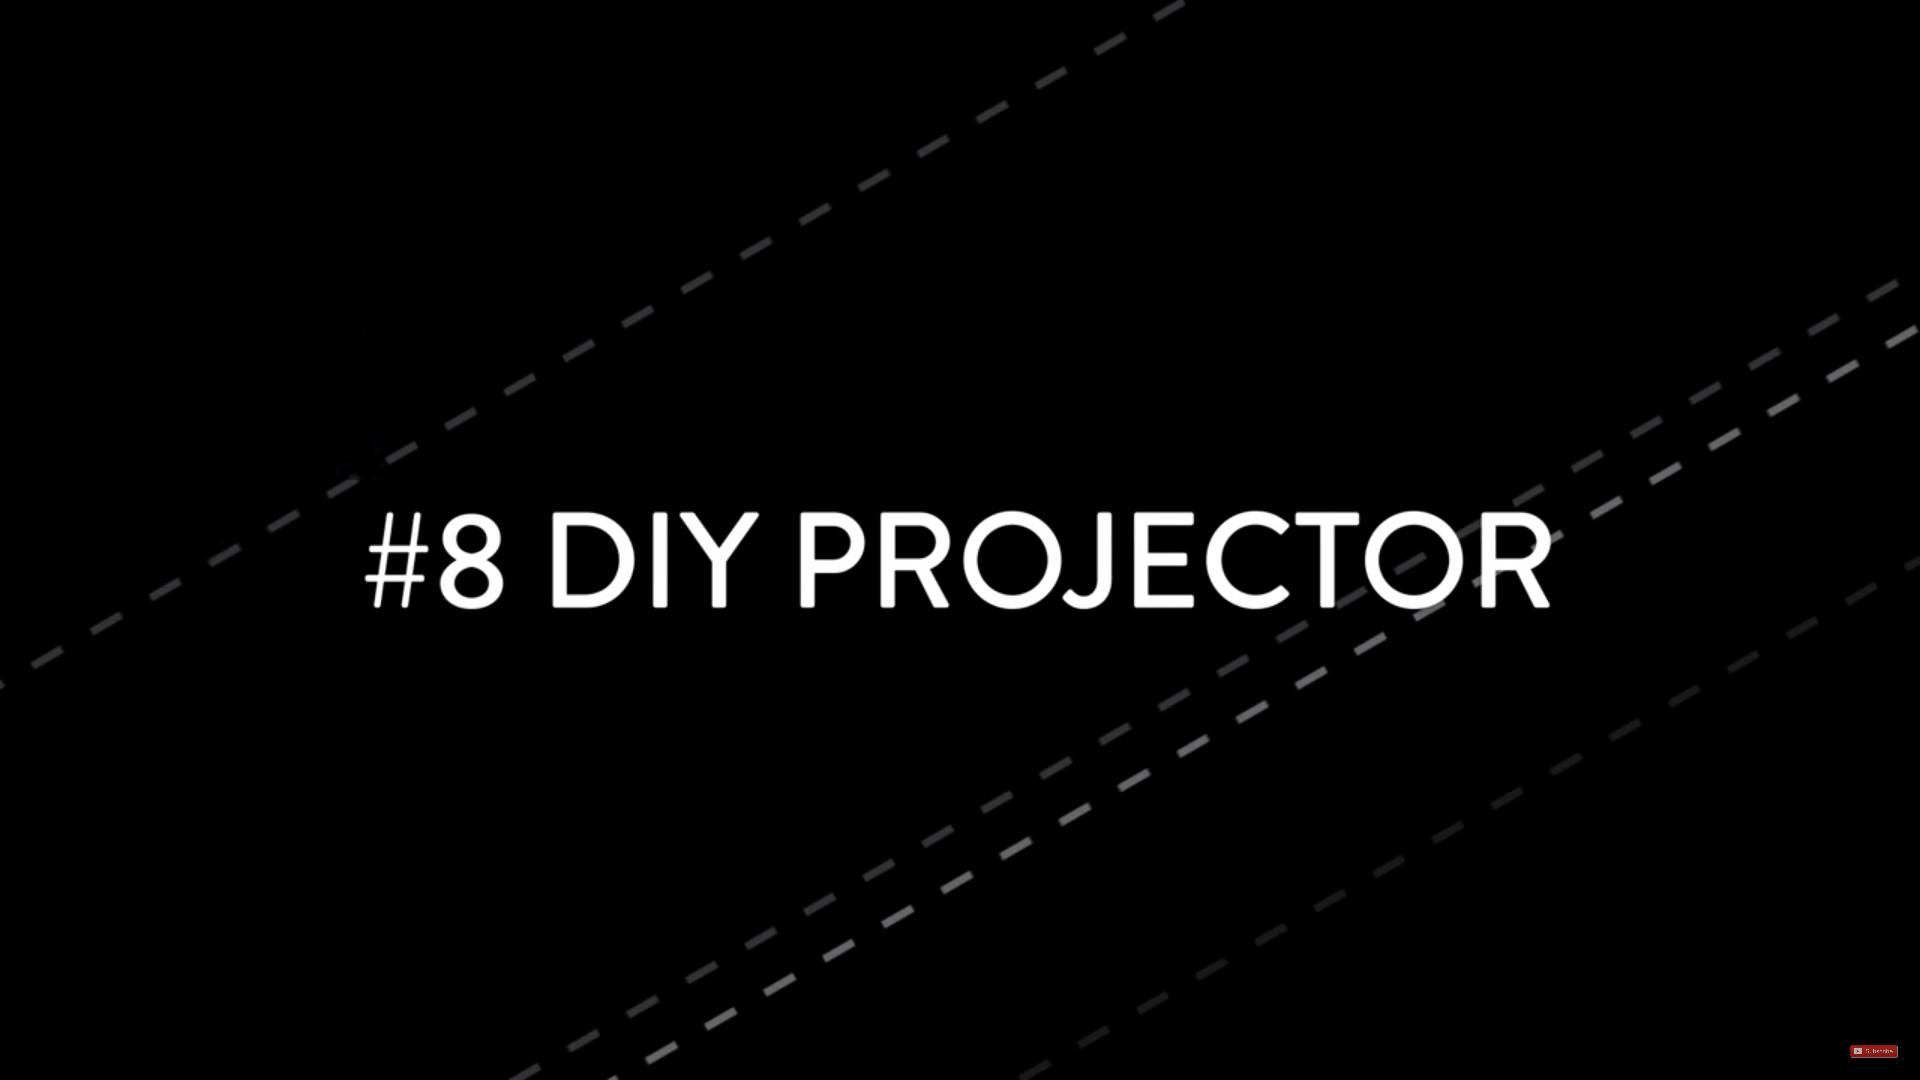 diyprojector min image